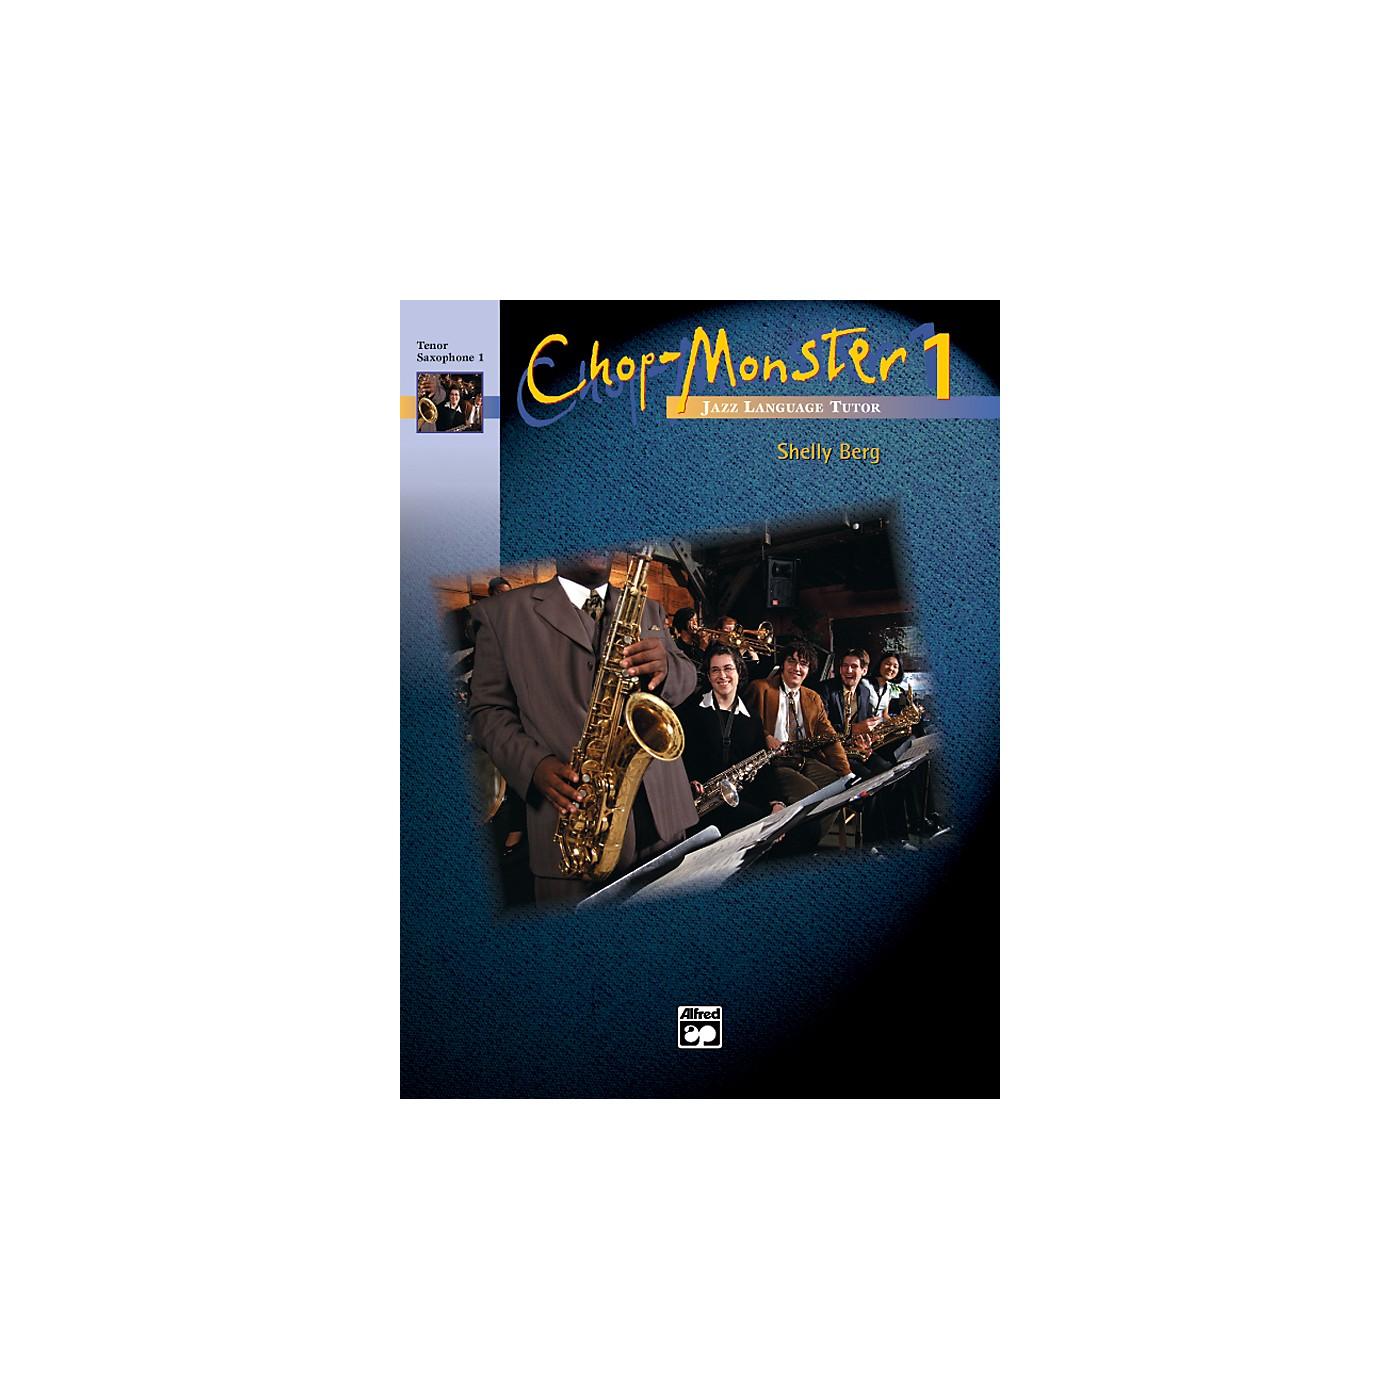 Alfred Chop-Monster Book 1 Baritone Saxophone Book & CD thumbnail